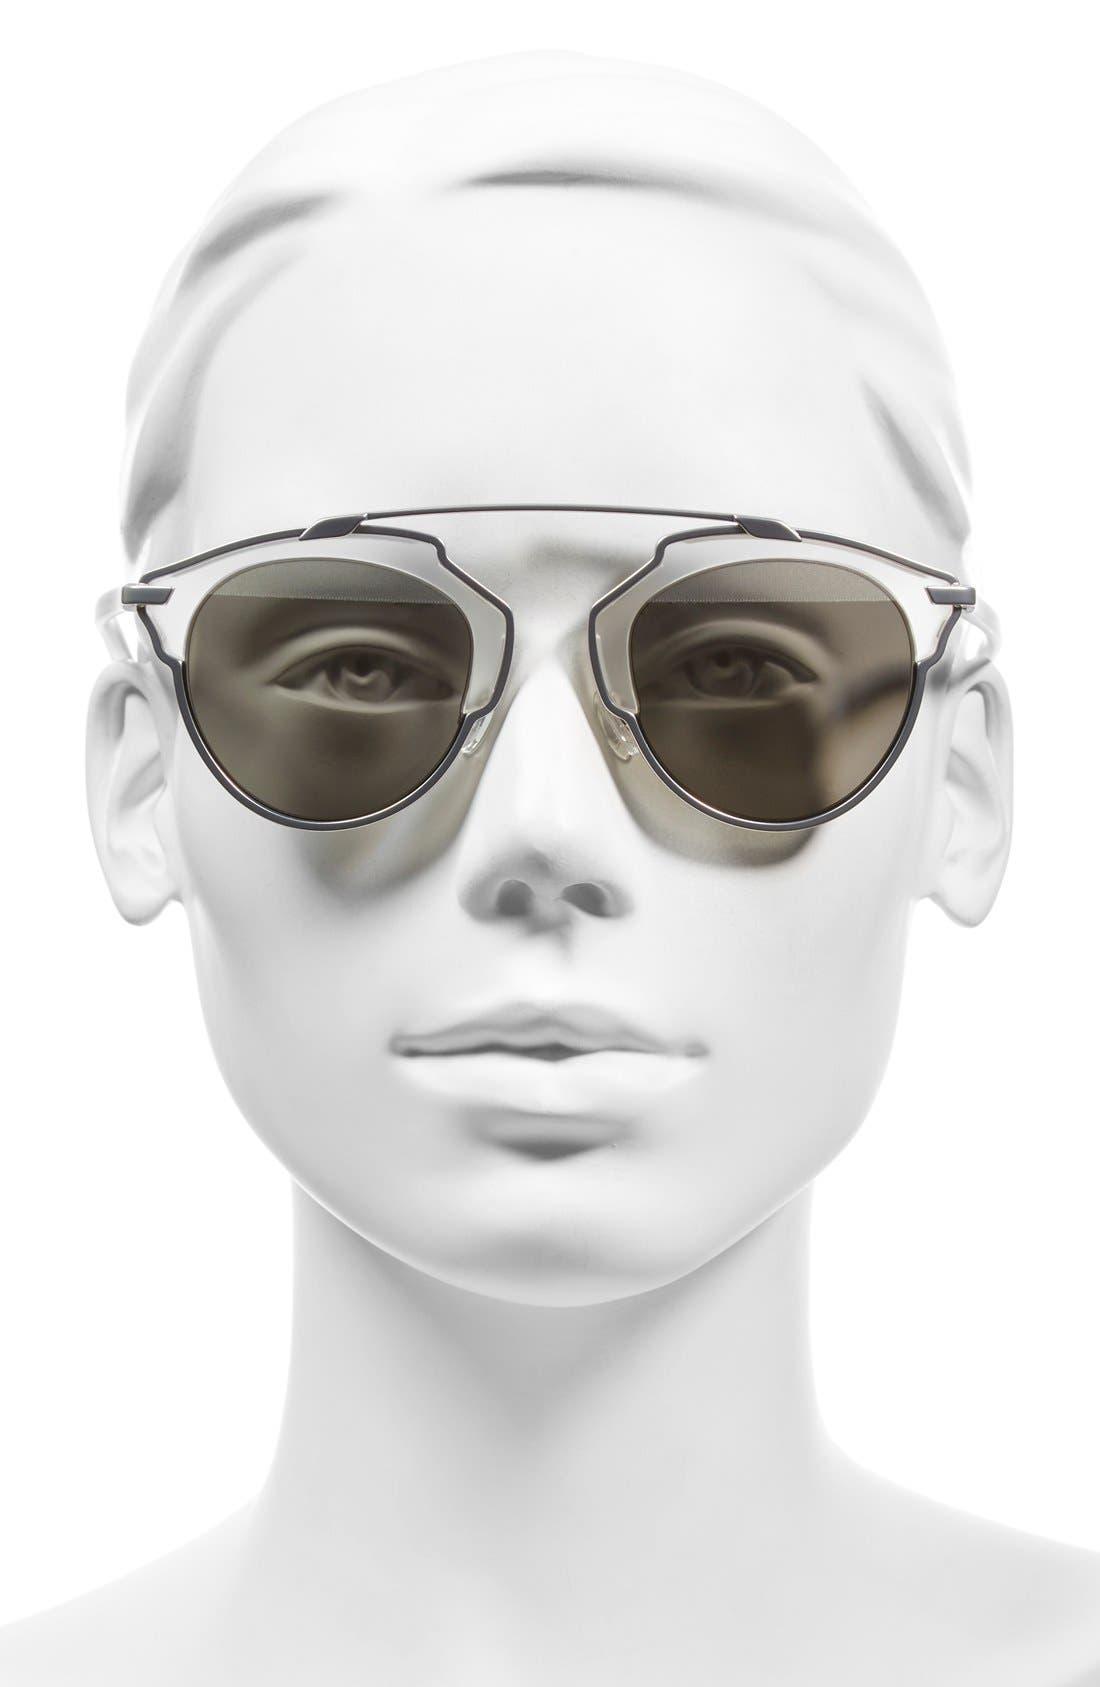 So Real 48mm Brow Bar Sunglasses,                             Alternate thumbnail 40, color,